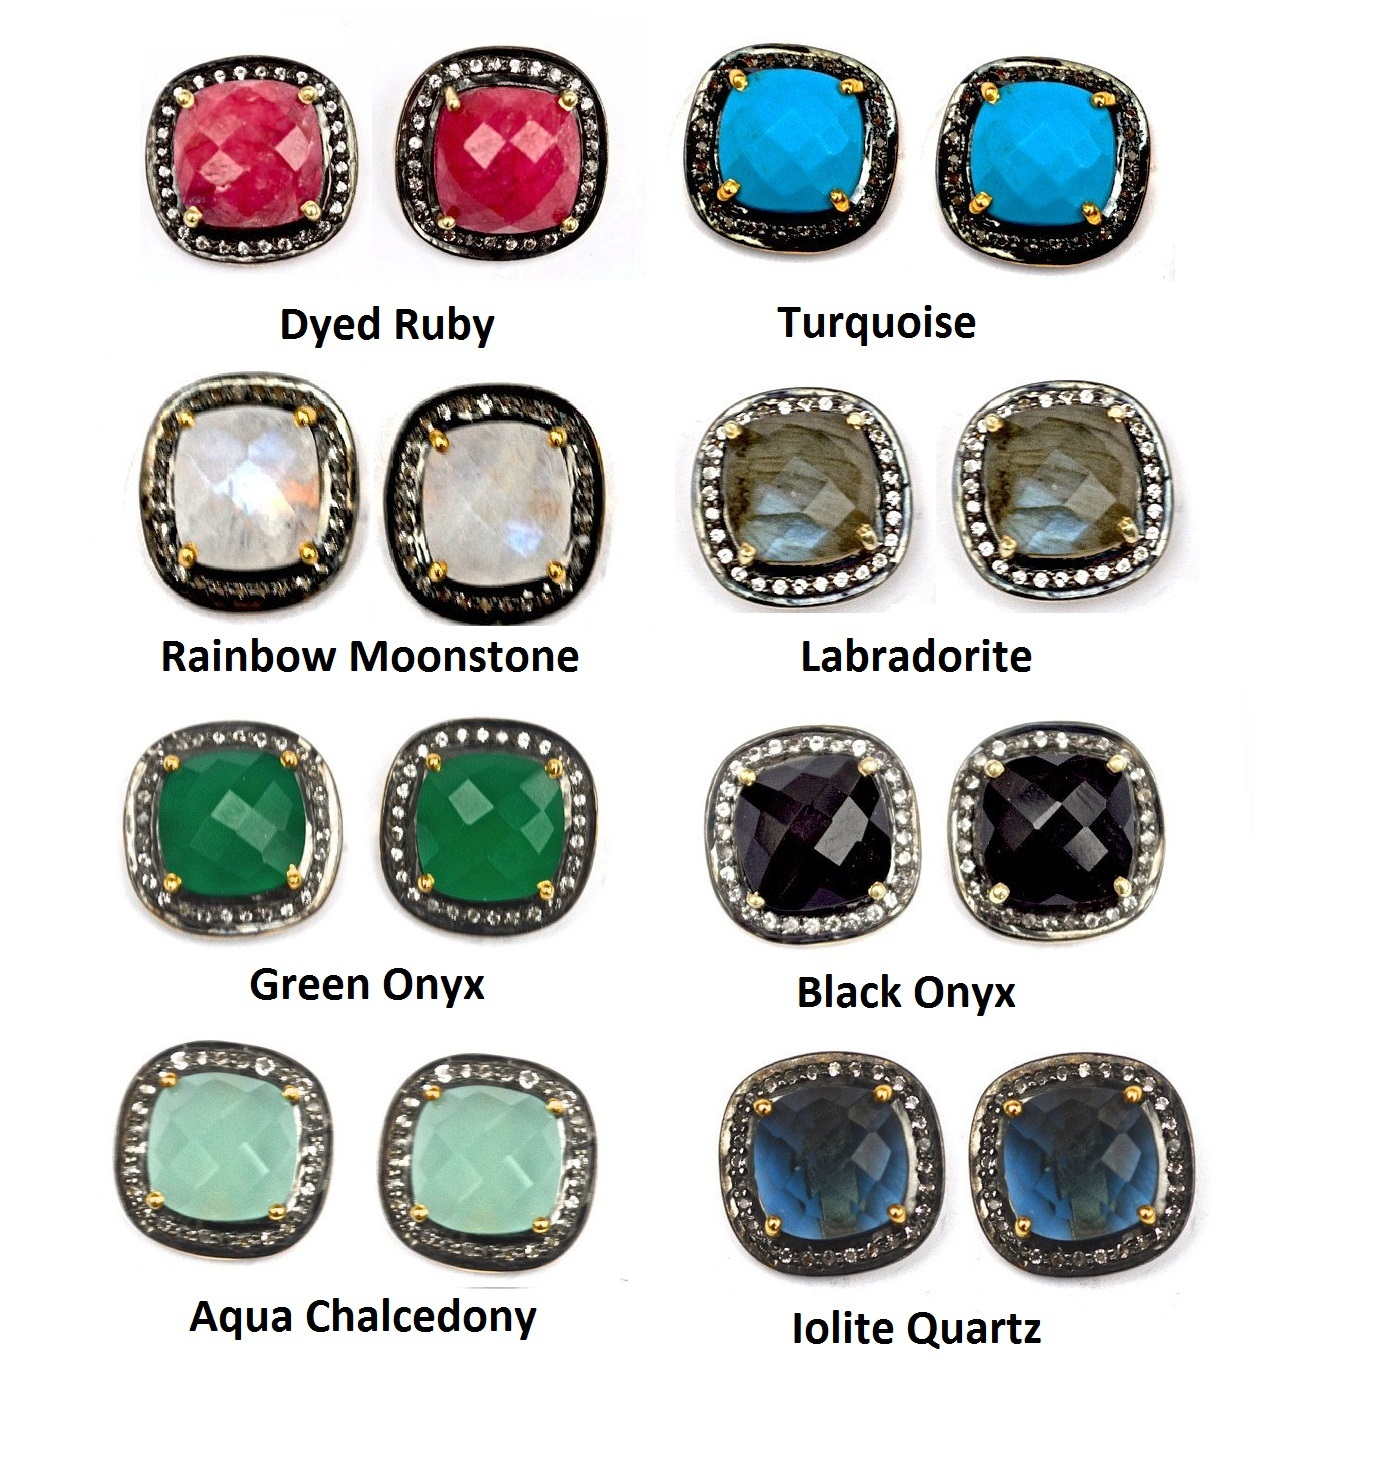 Pave Diamond Set Iolite Quartz Cushion Shape Gemstone Stud Earrings